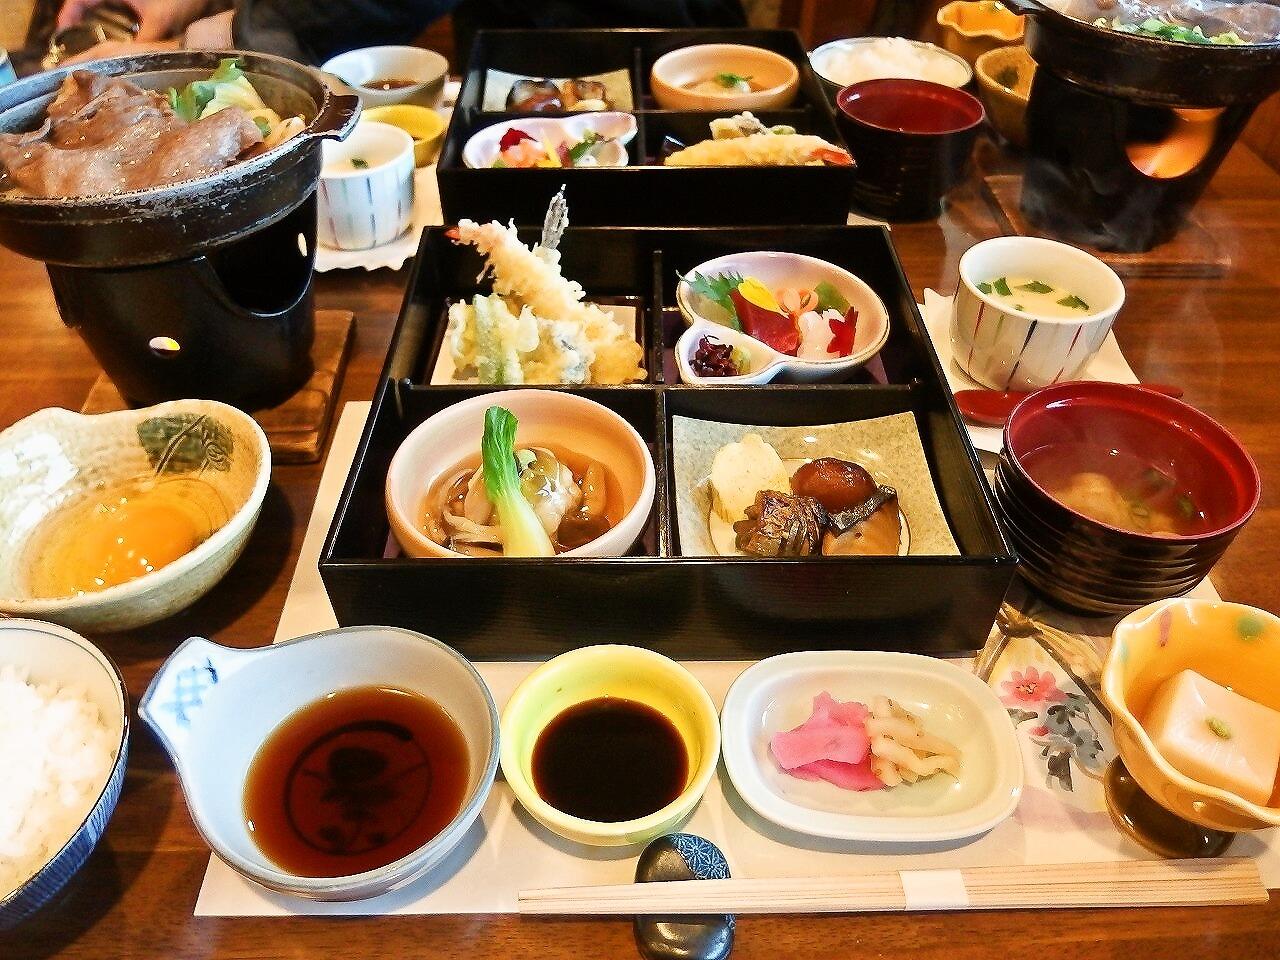 s-foodpic6568318.jpg